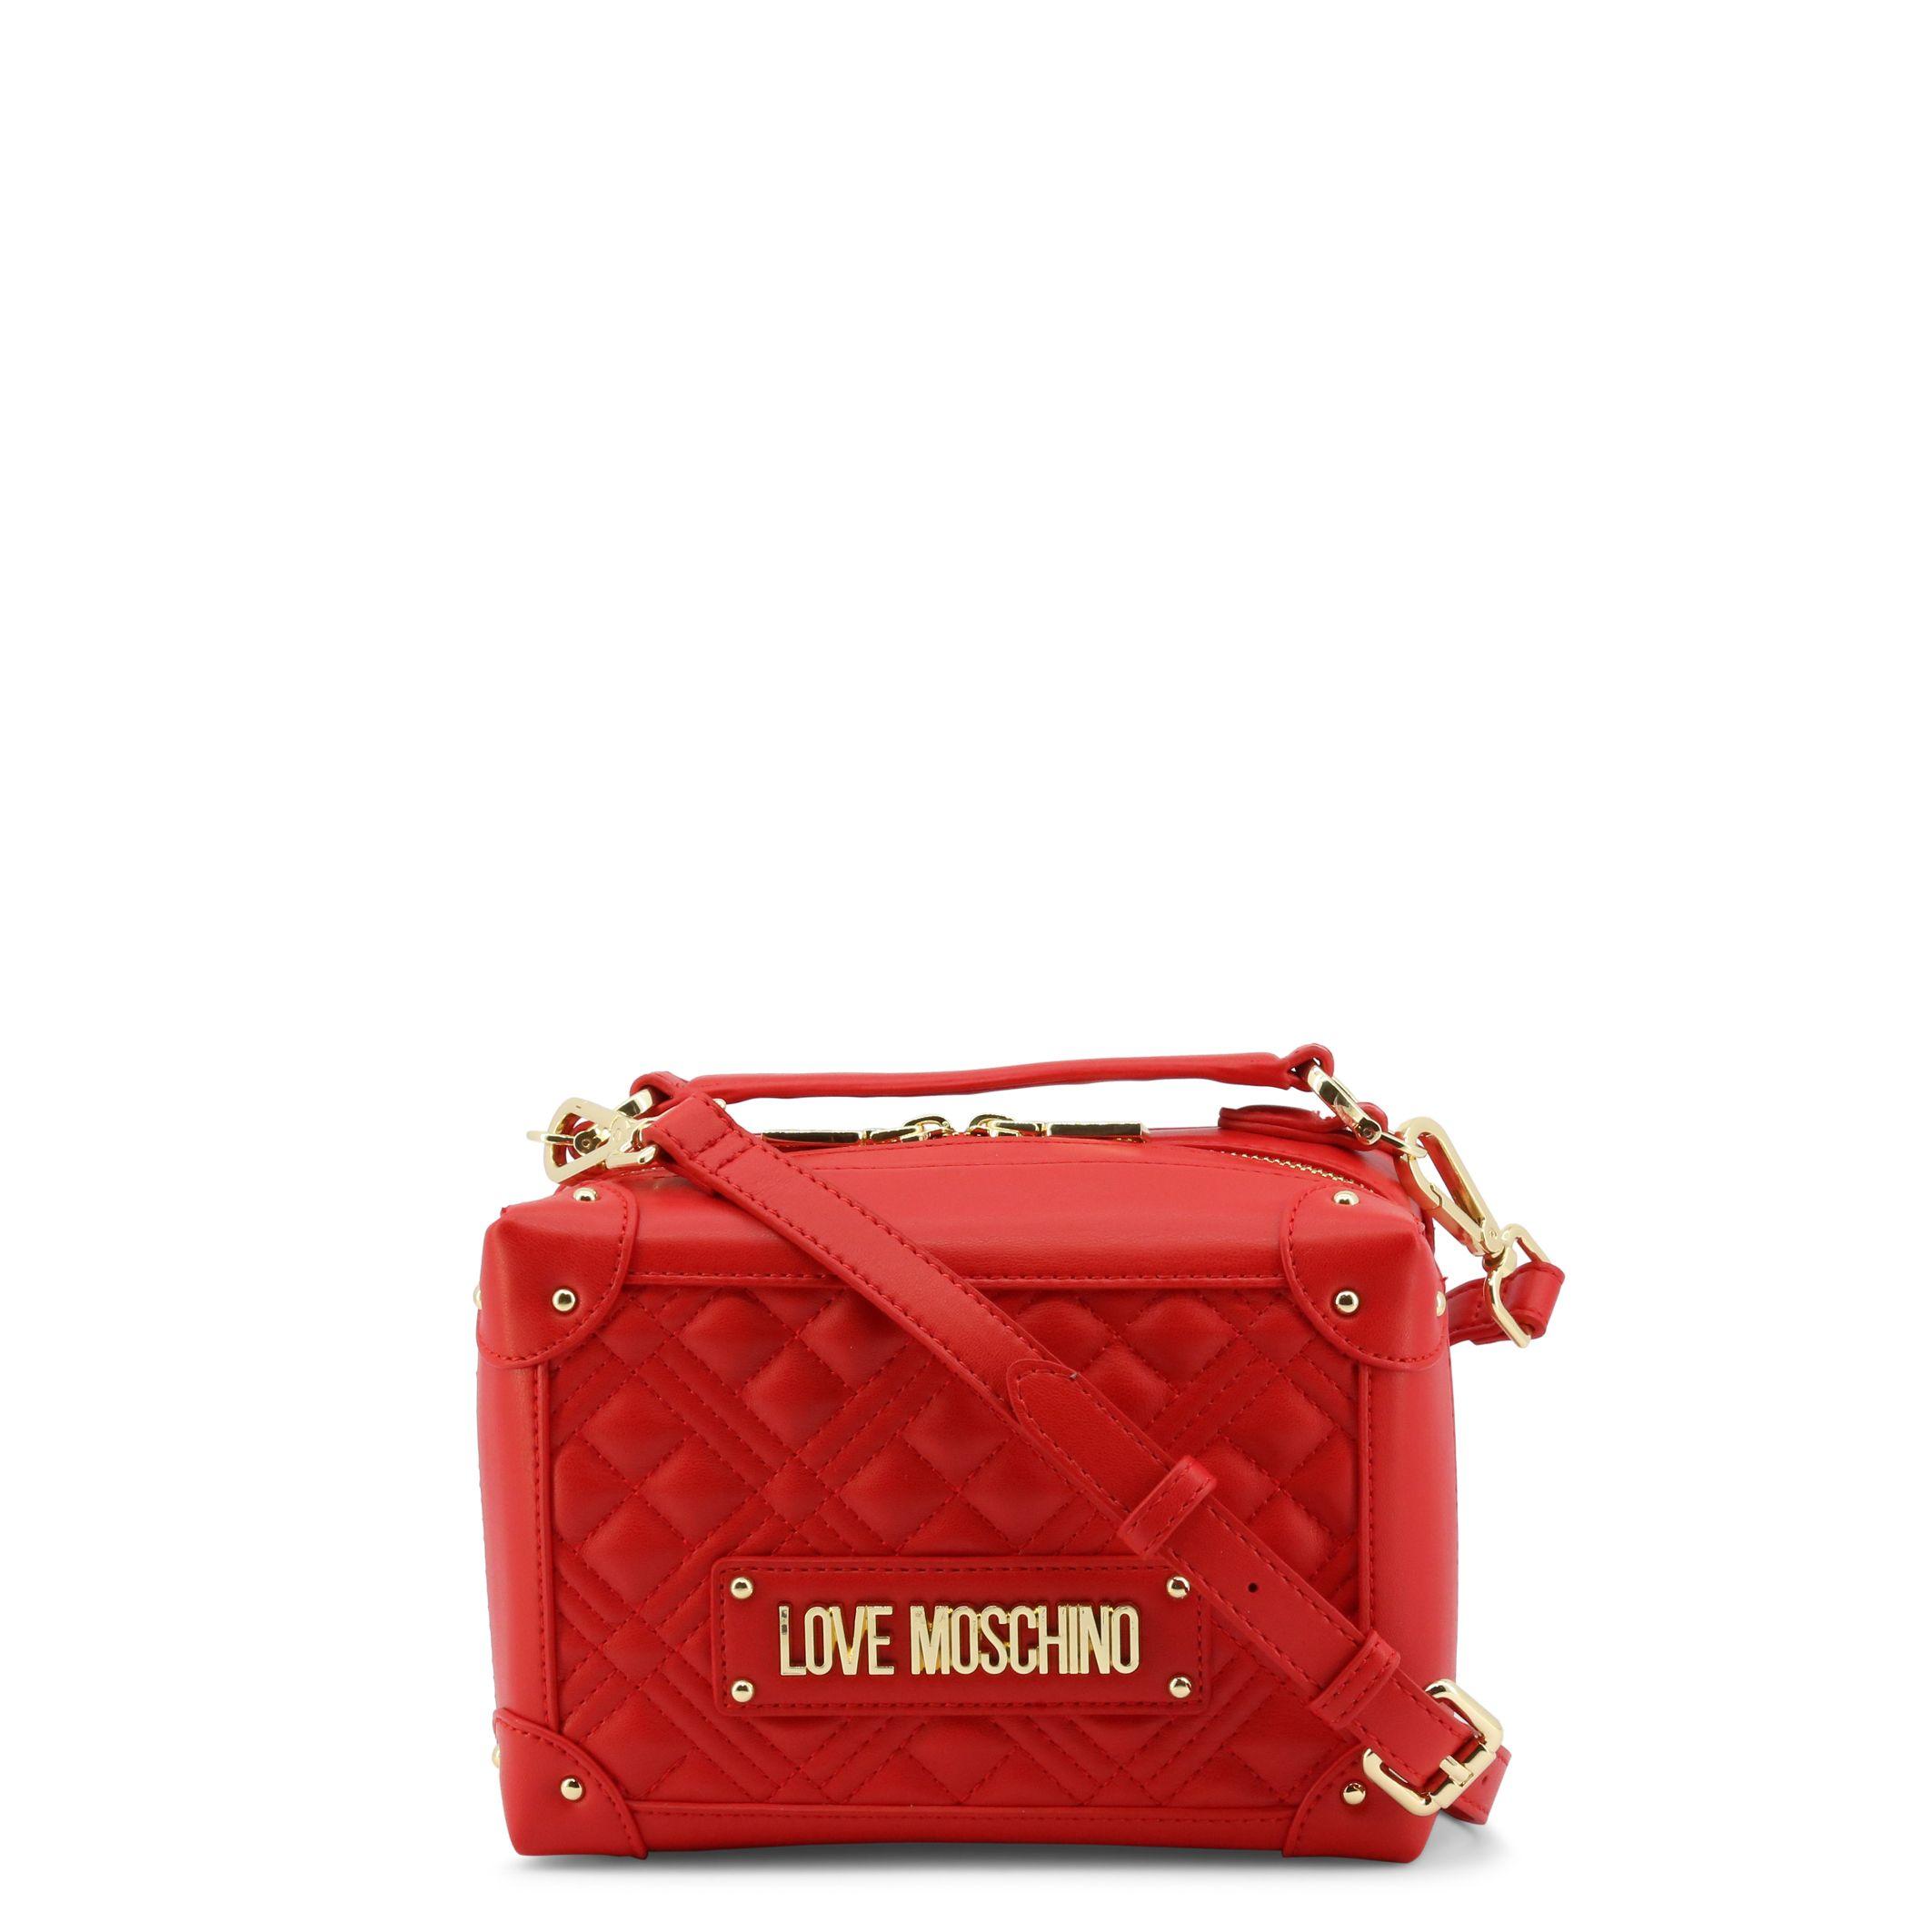 Love Moschino – JC4204PP0CKA0 – Rood Designeritems.nl